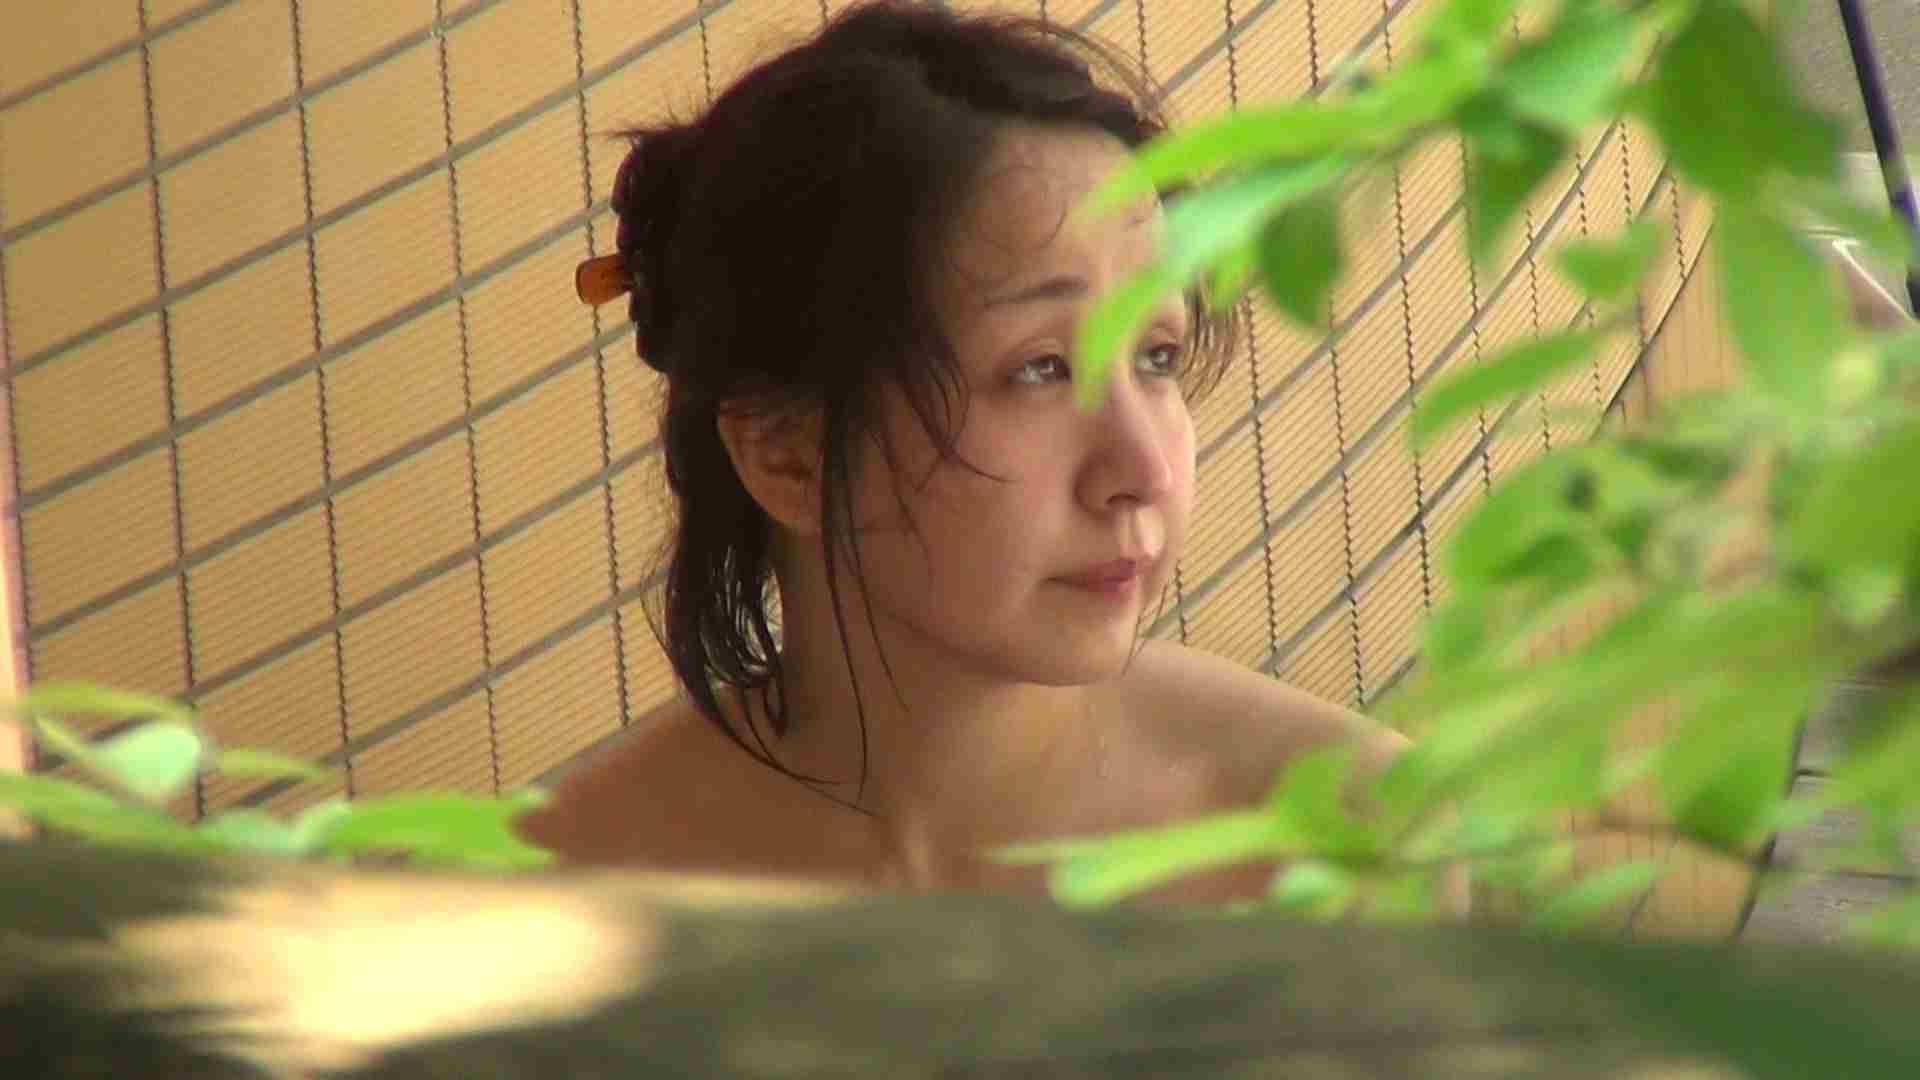 Aquaな露天風呂Vol.308 盗撮映像  75Pix 18